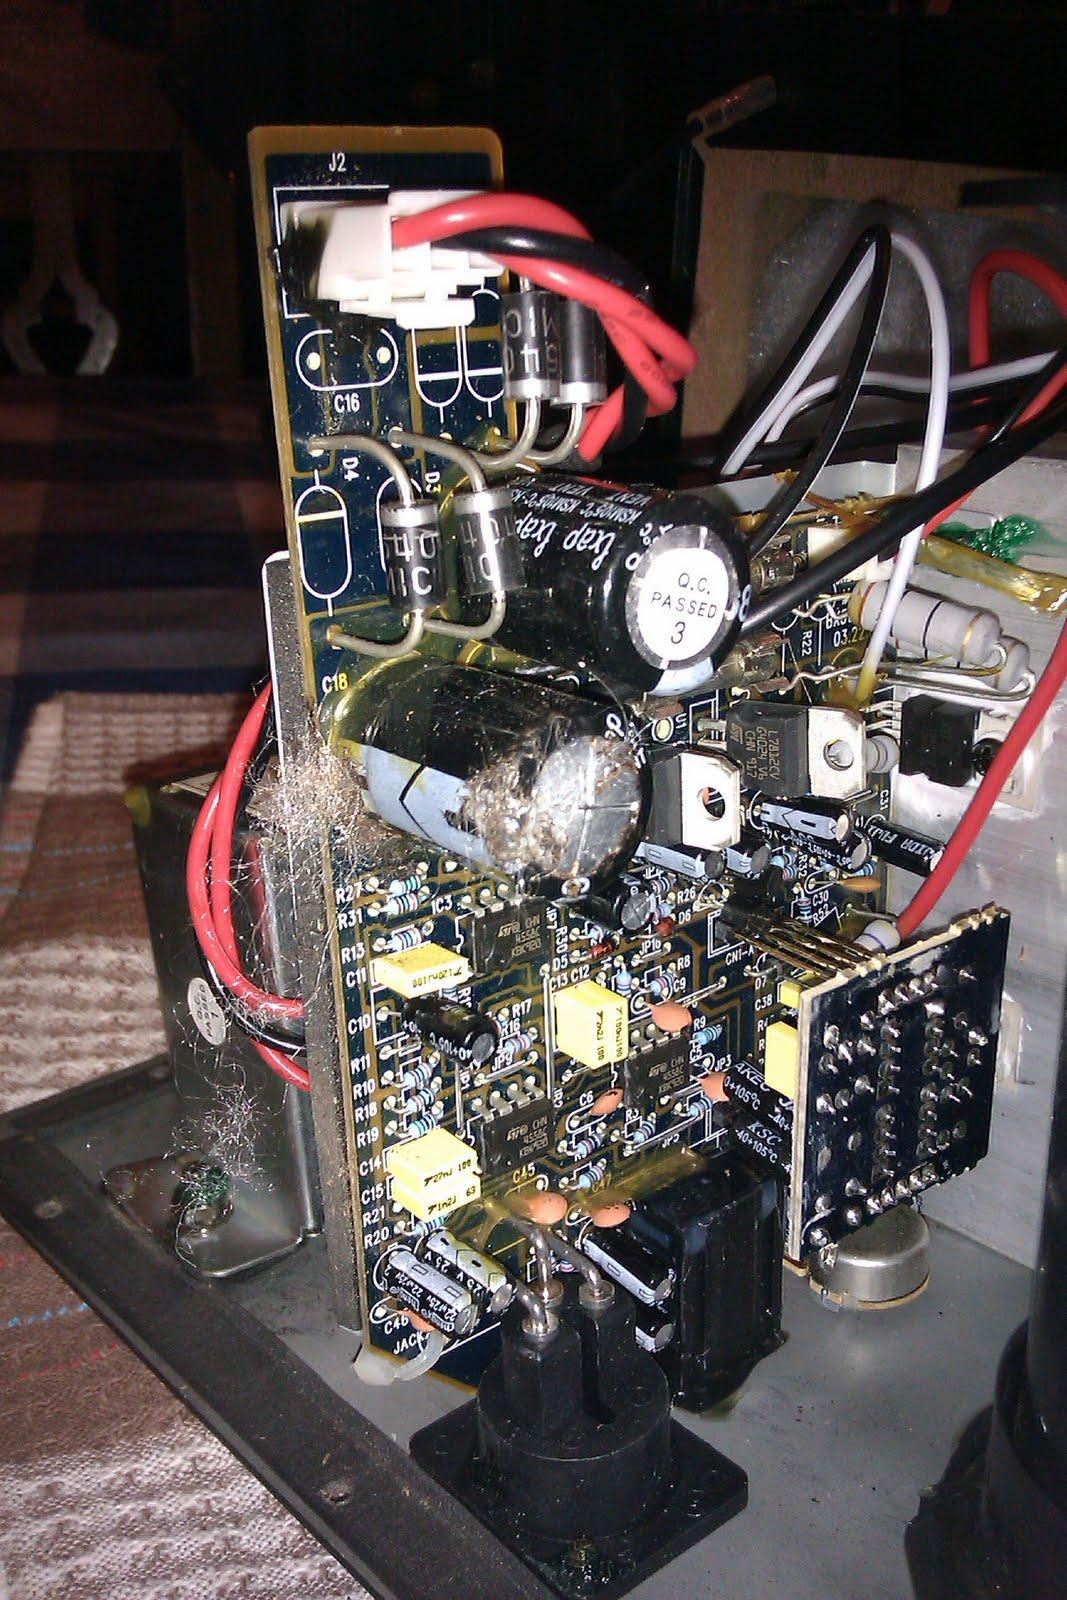 mending things: Mending a pair of M-AUDIO BX5a monitors on m-audio monitors, m-audio bx5, m-audio speakers, m-audio studiophile bx8, m-audio bx8a, m-audio mobilepre usb driver, m-audio dmp3,